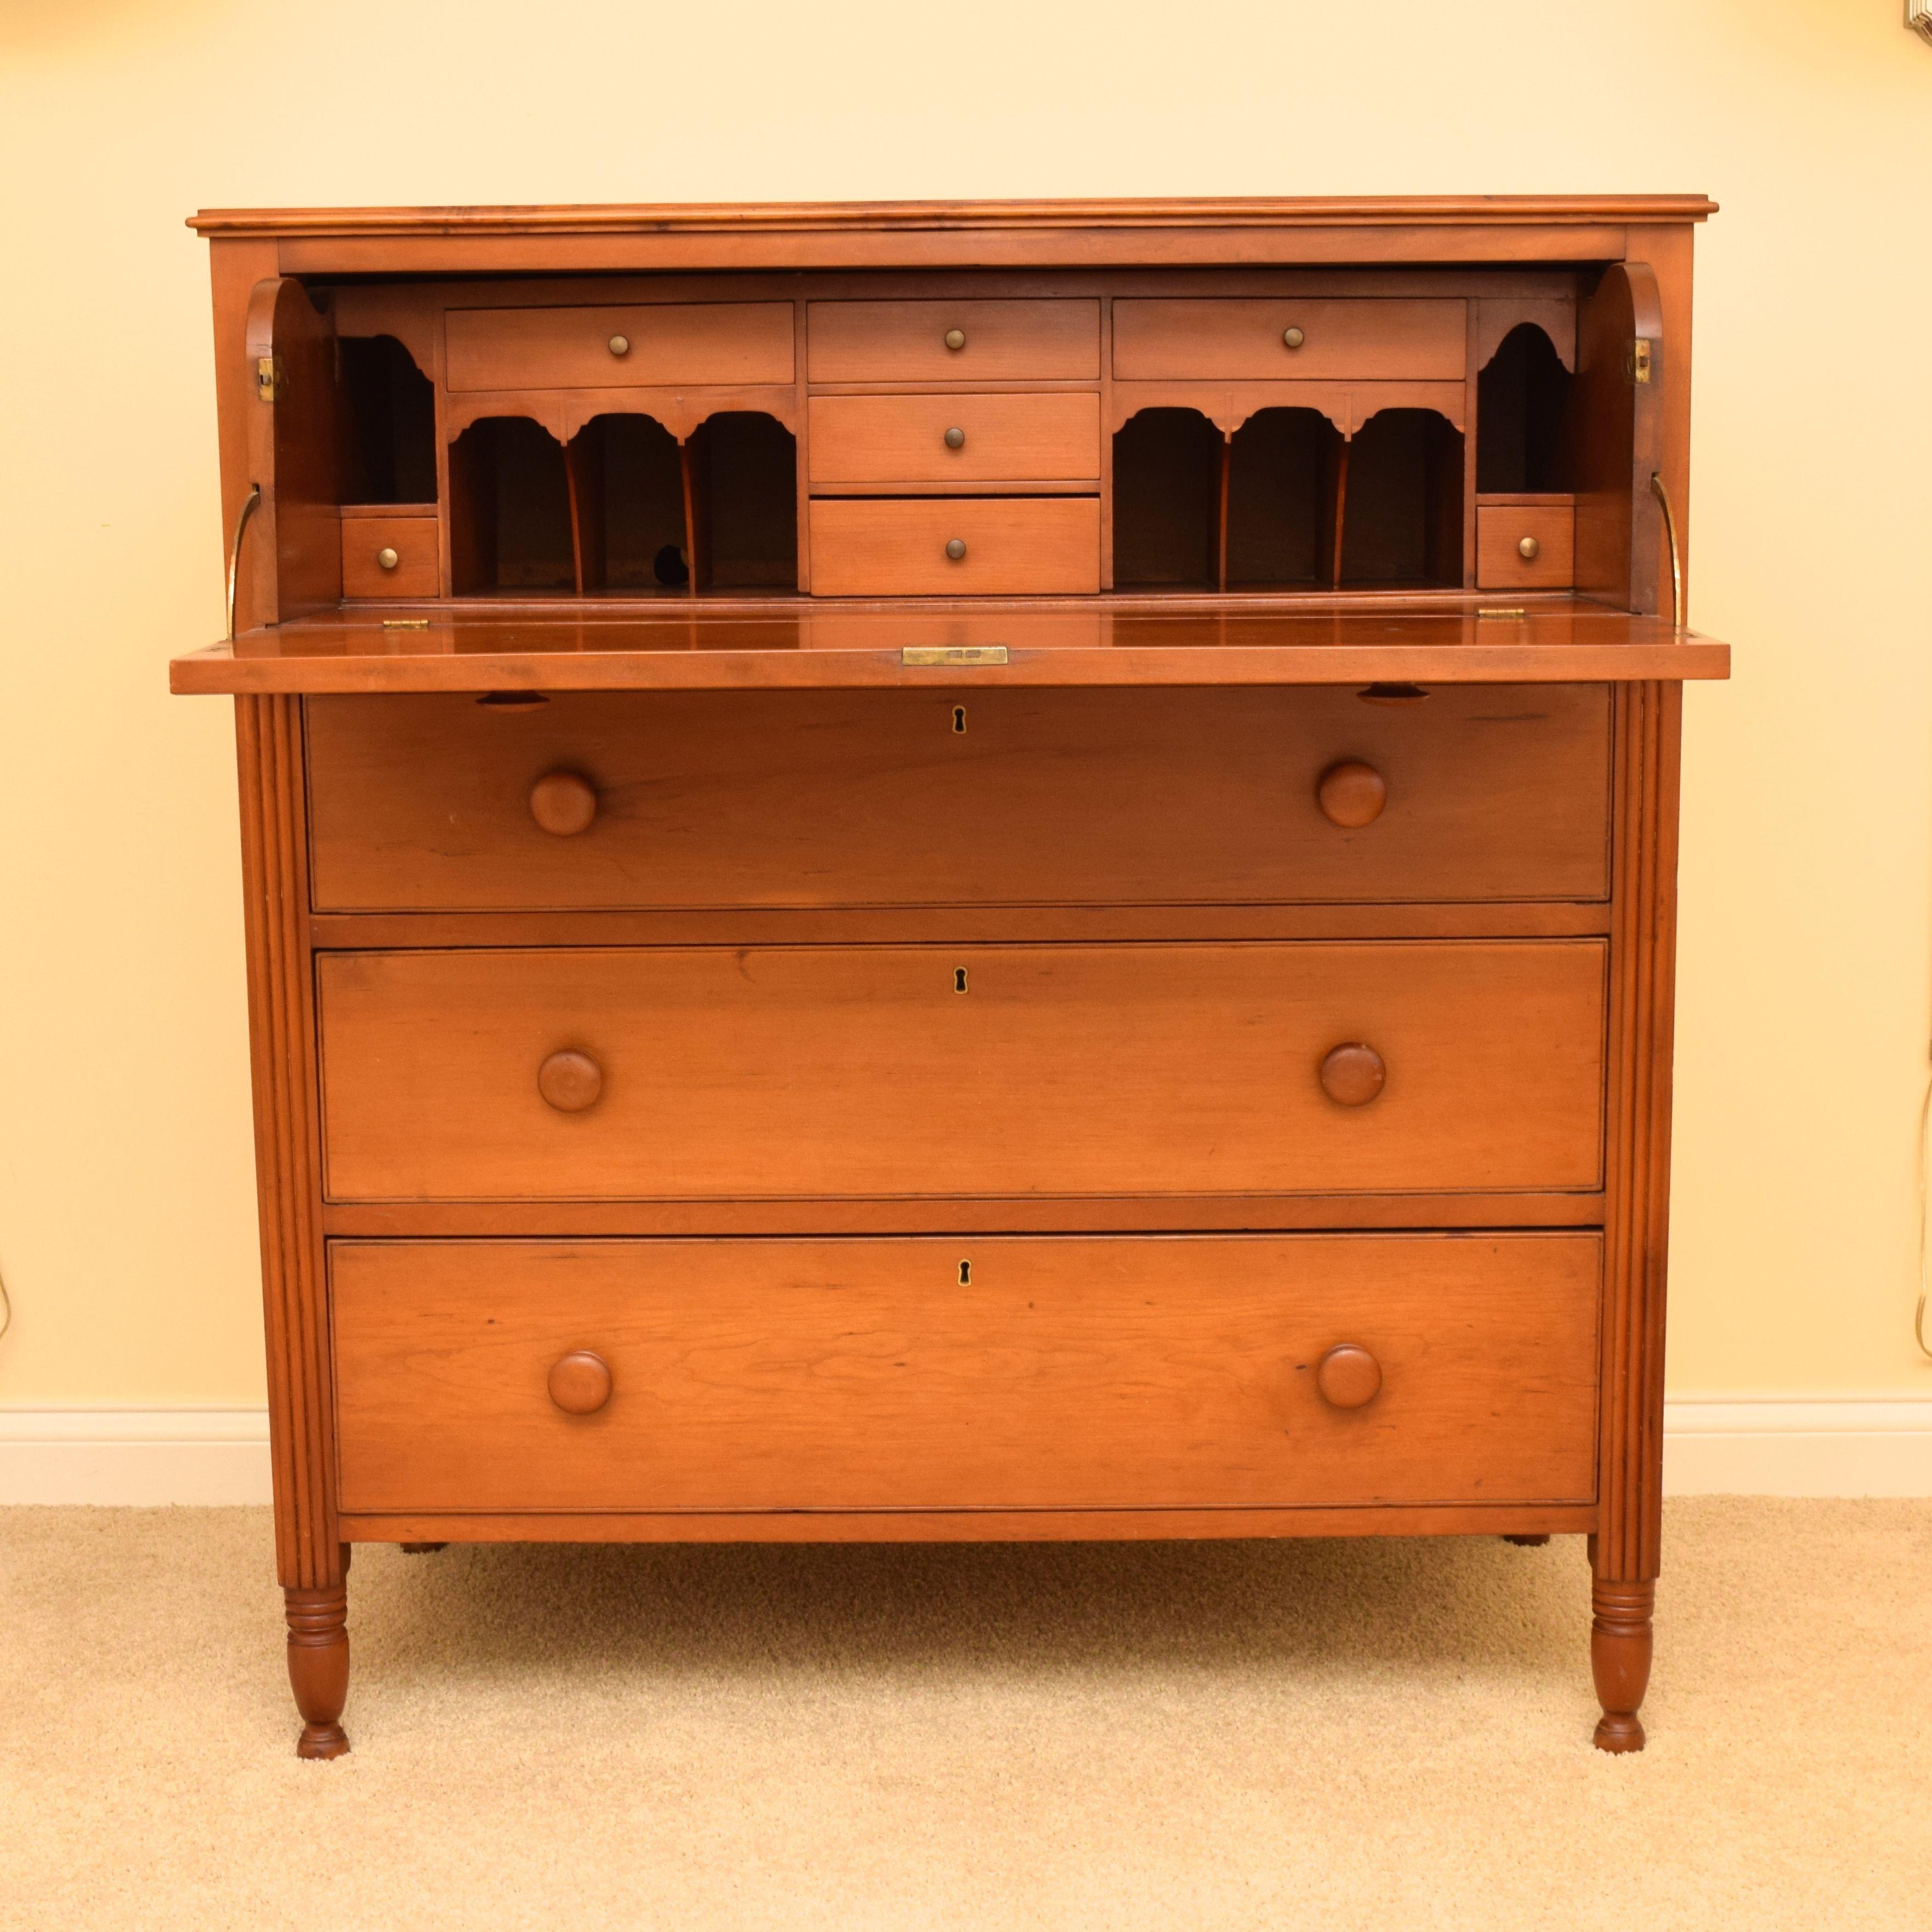 Antique Maple Butler's Desk